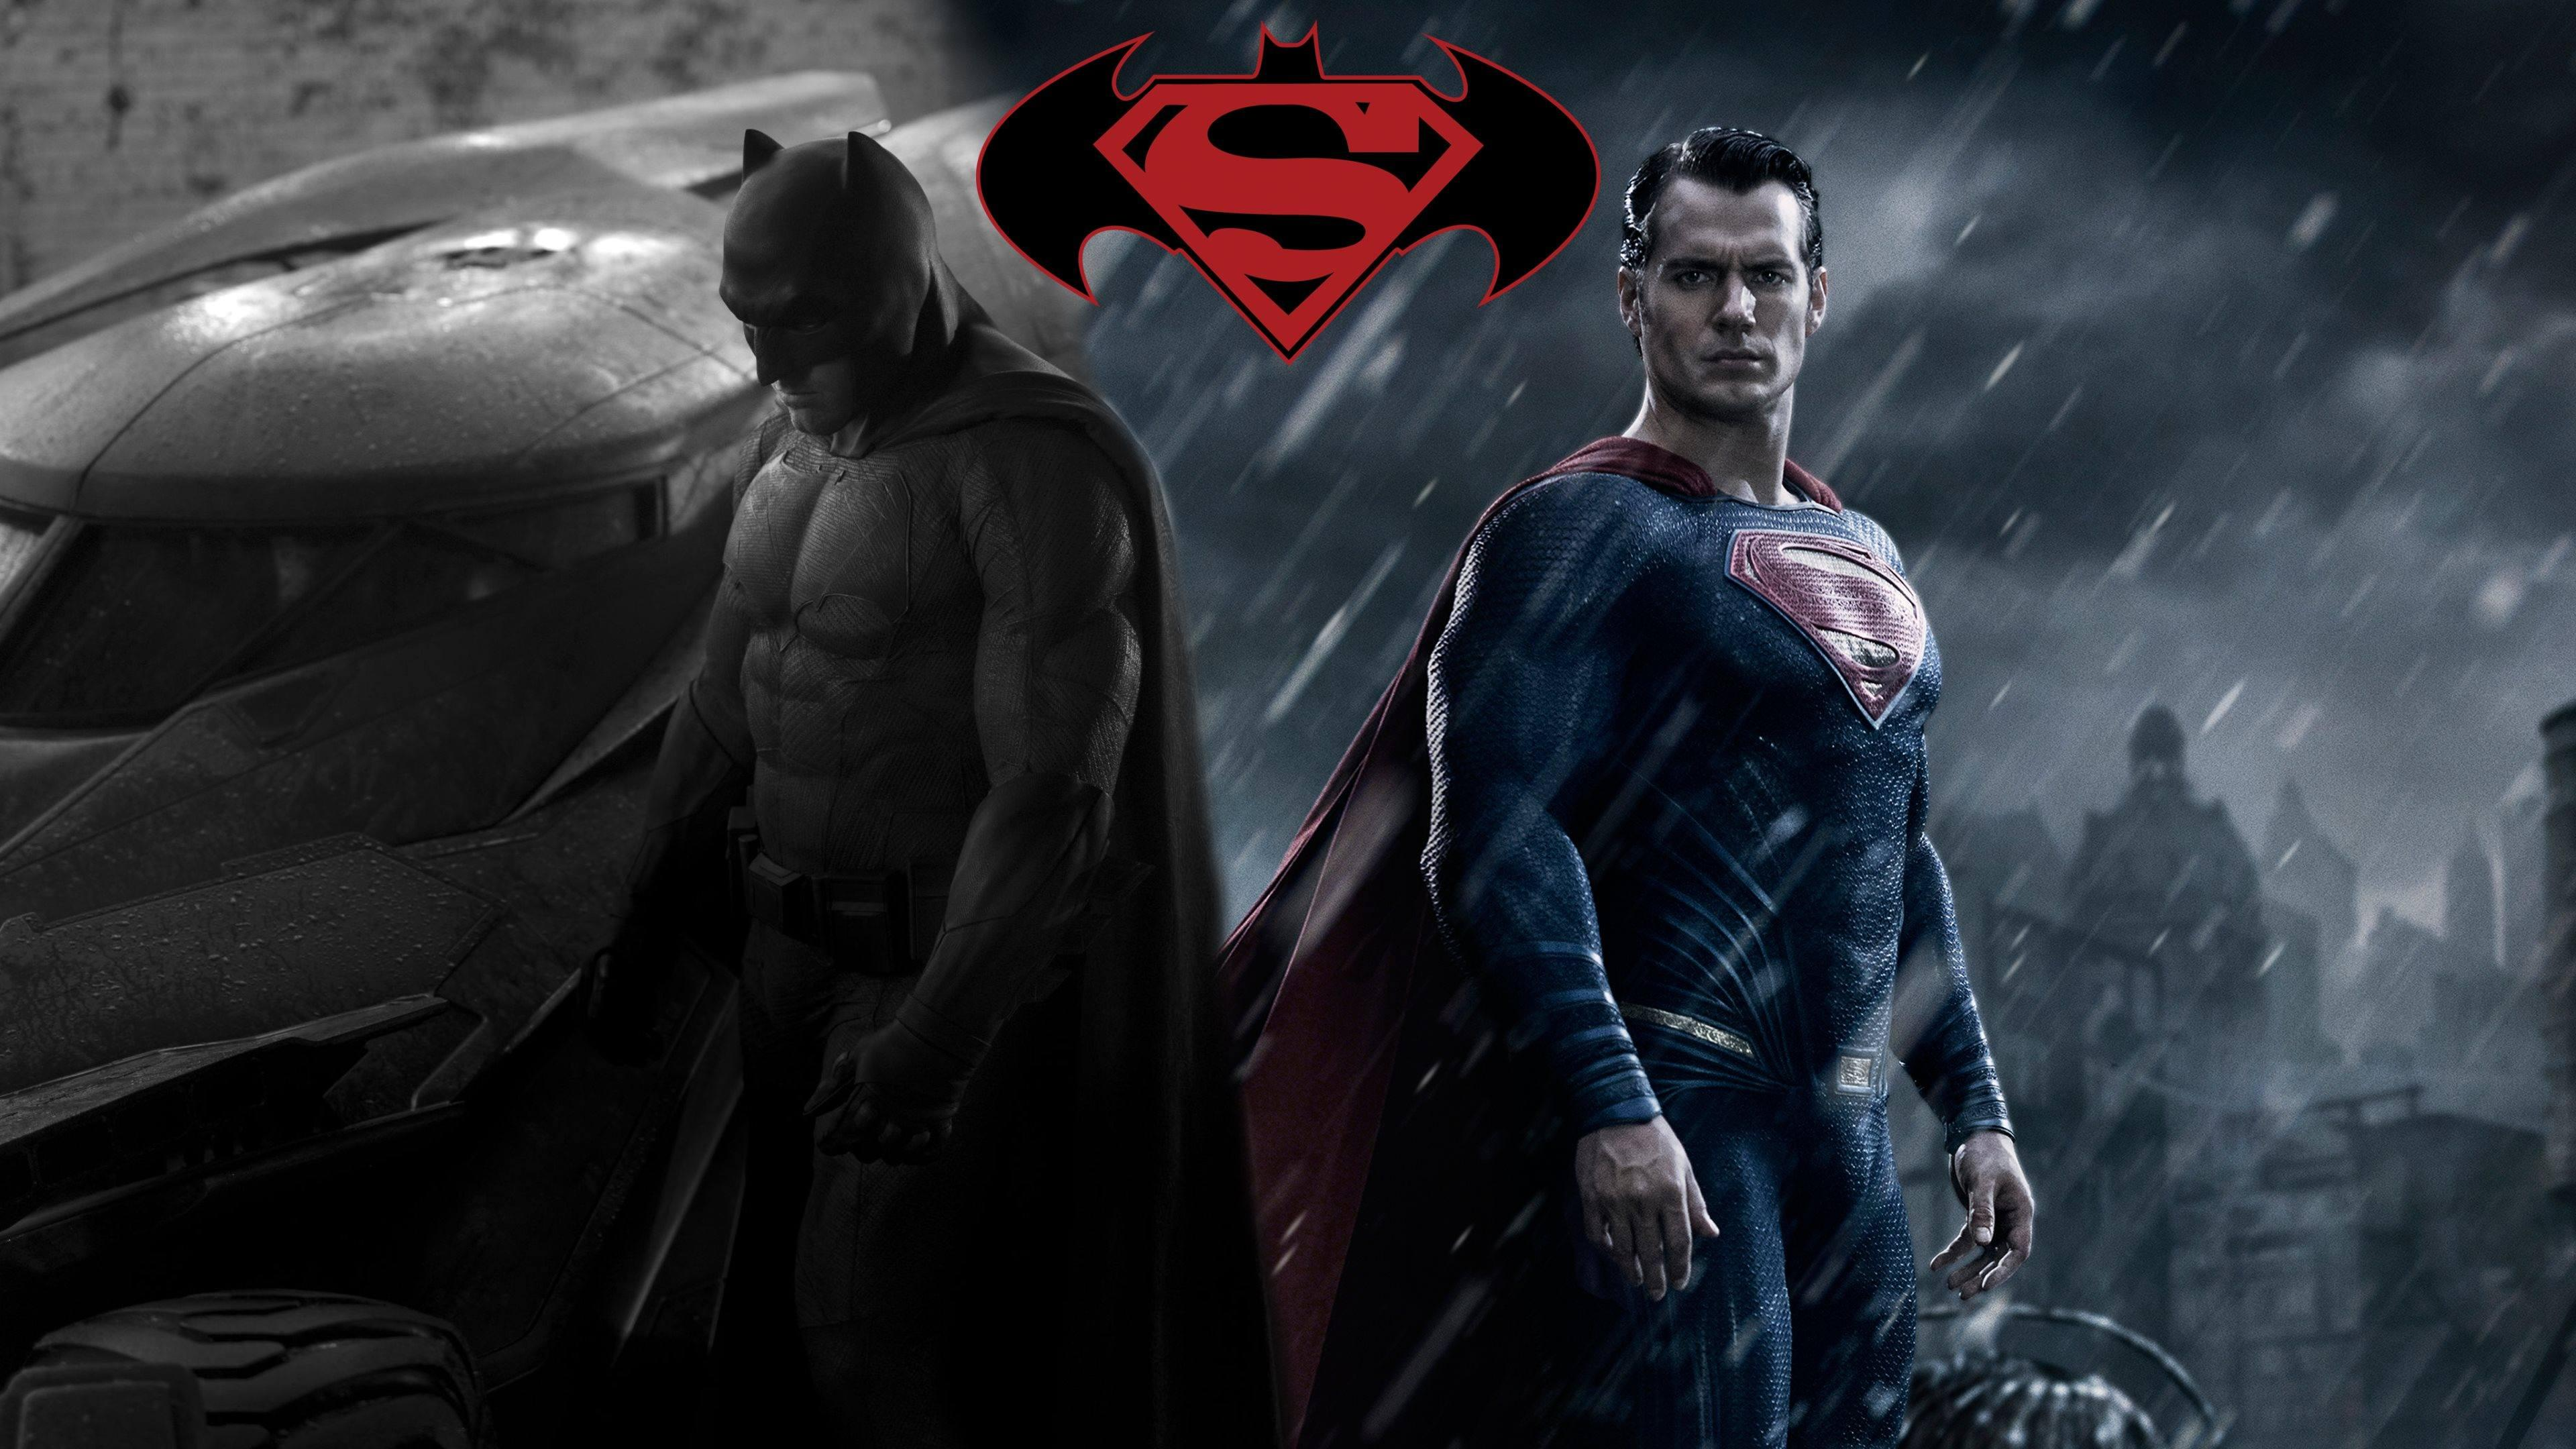 Batman Vs Superman Art Ultra Hd 4k Wallpaper 3840x2160   HD Wallpapers 3840x2160